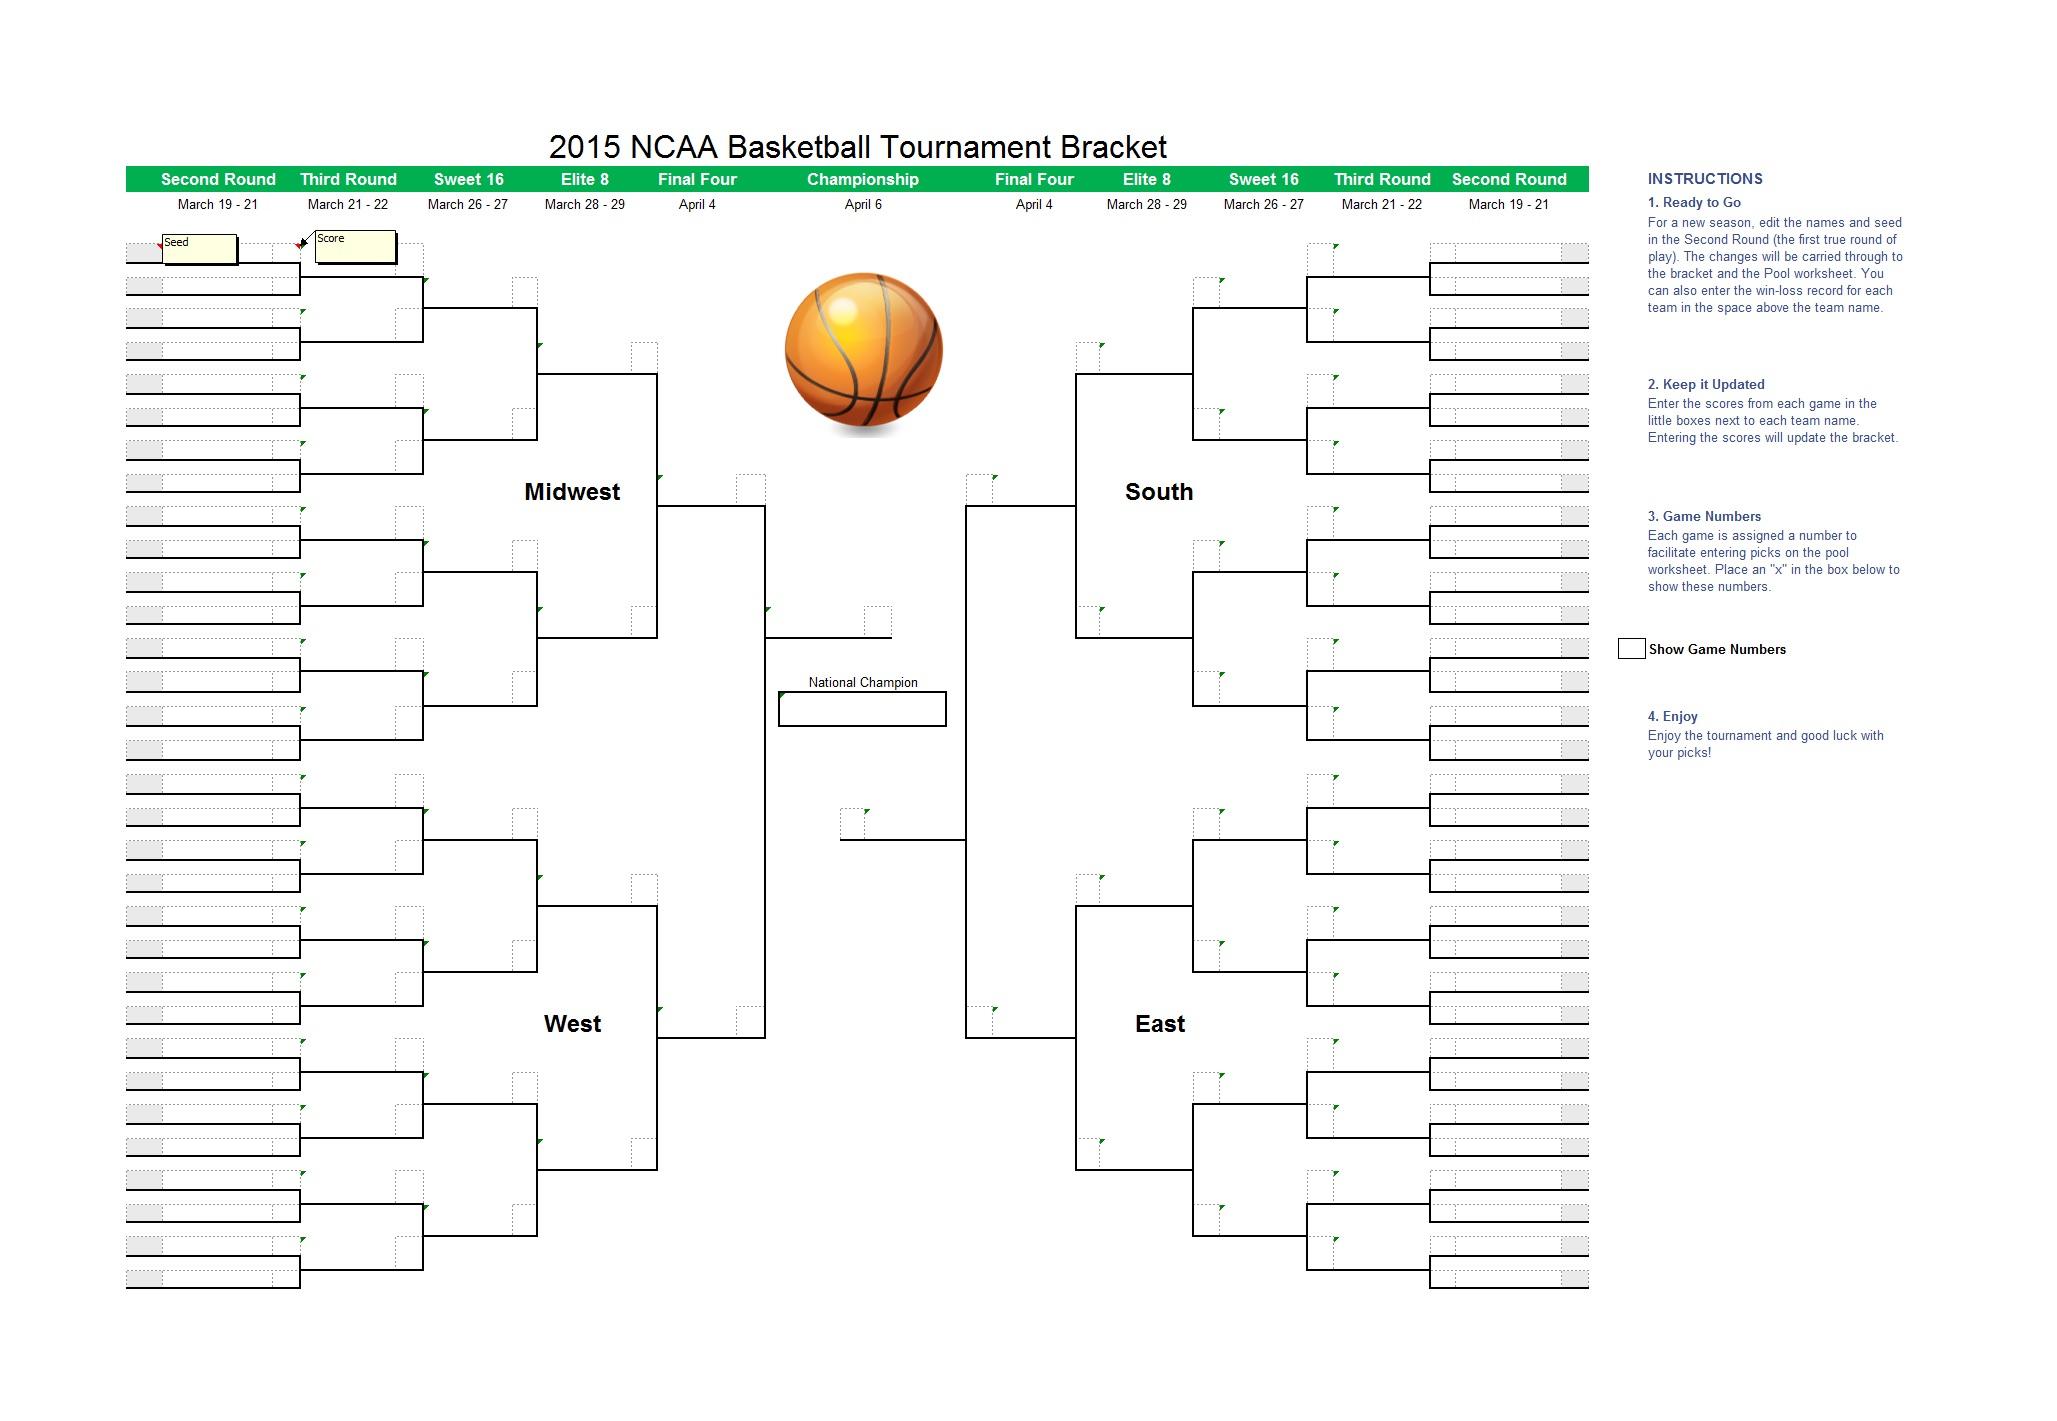 34 Blank Tournament Bracket Templates (&100% Free) - Template Lab - Free Printable Brackets